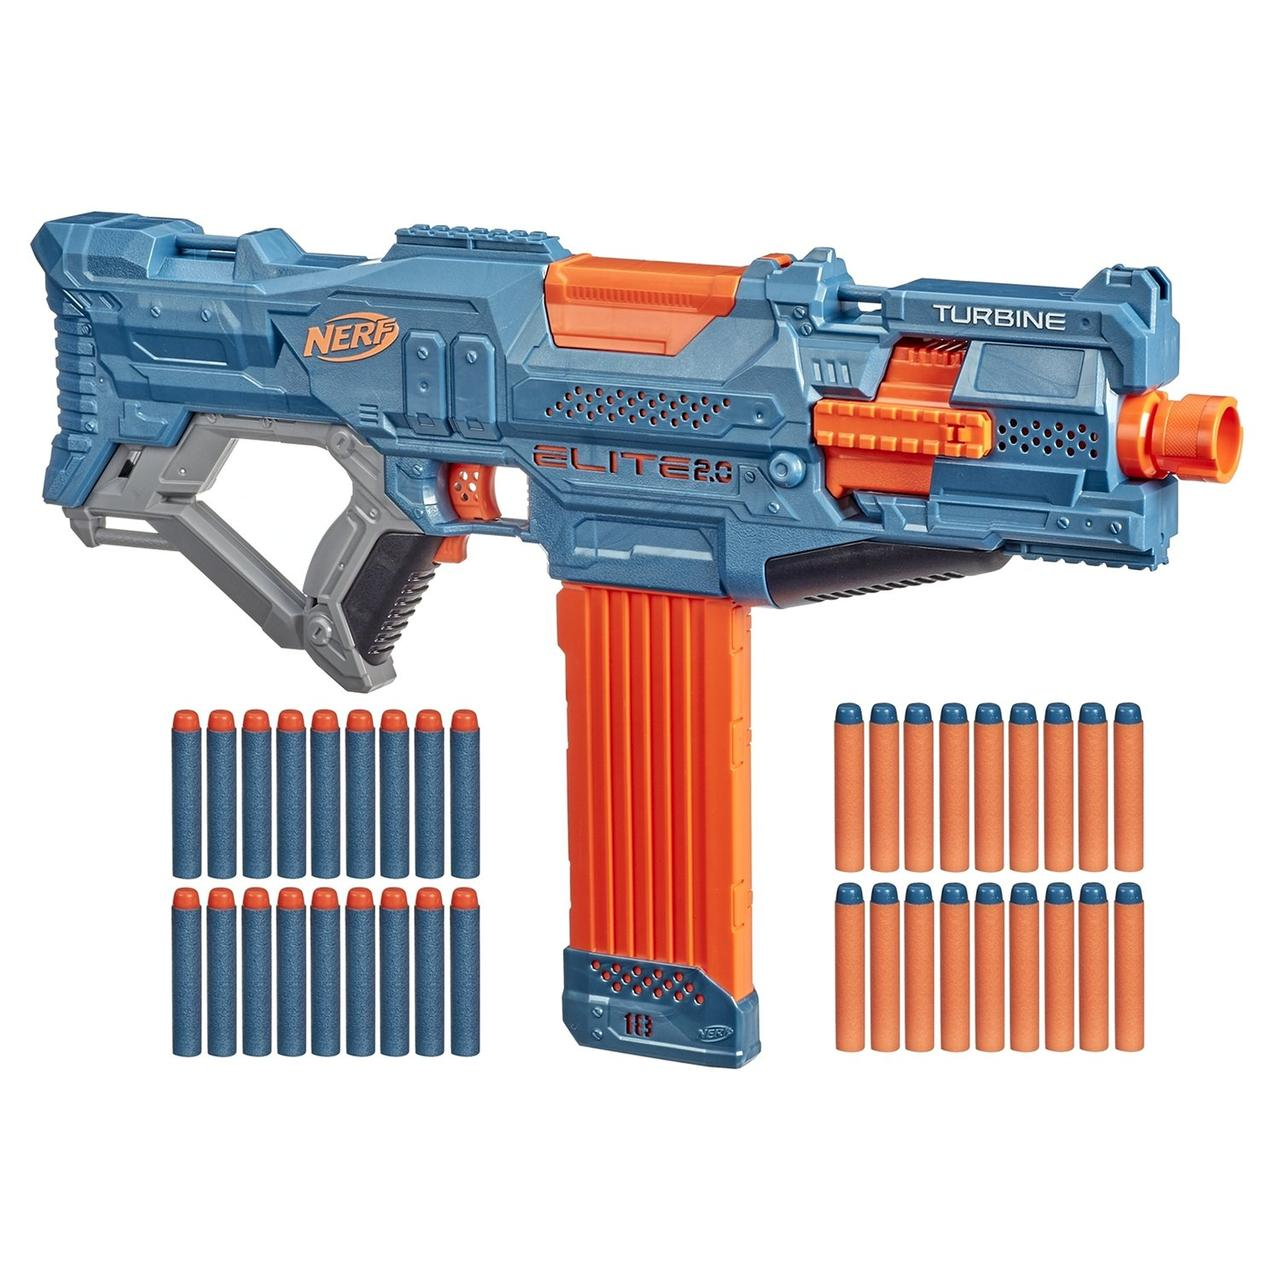 Hasbro Nerf N-Strike Elite 2,0 Автоматический Бластер Нерф Турбина ЦС-18 (Turbine CS-18)